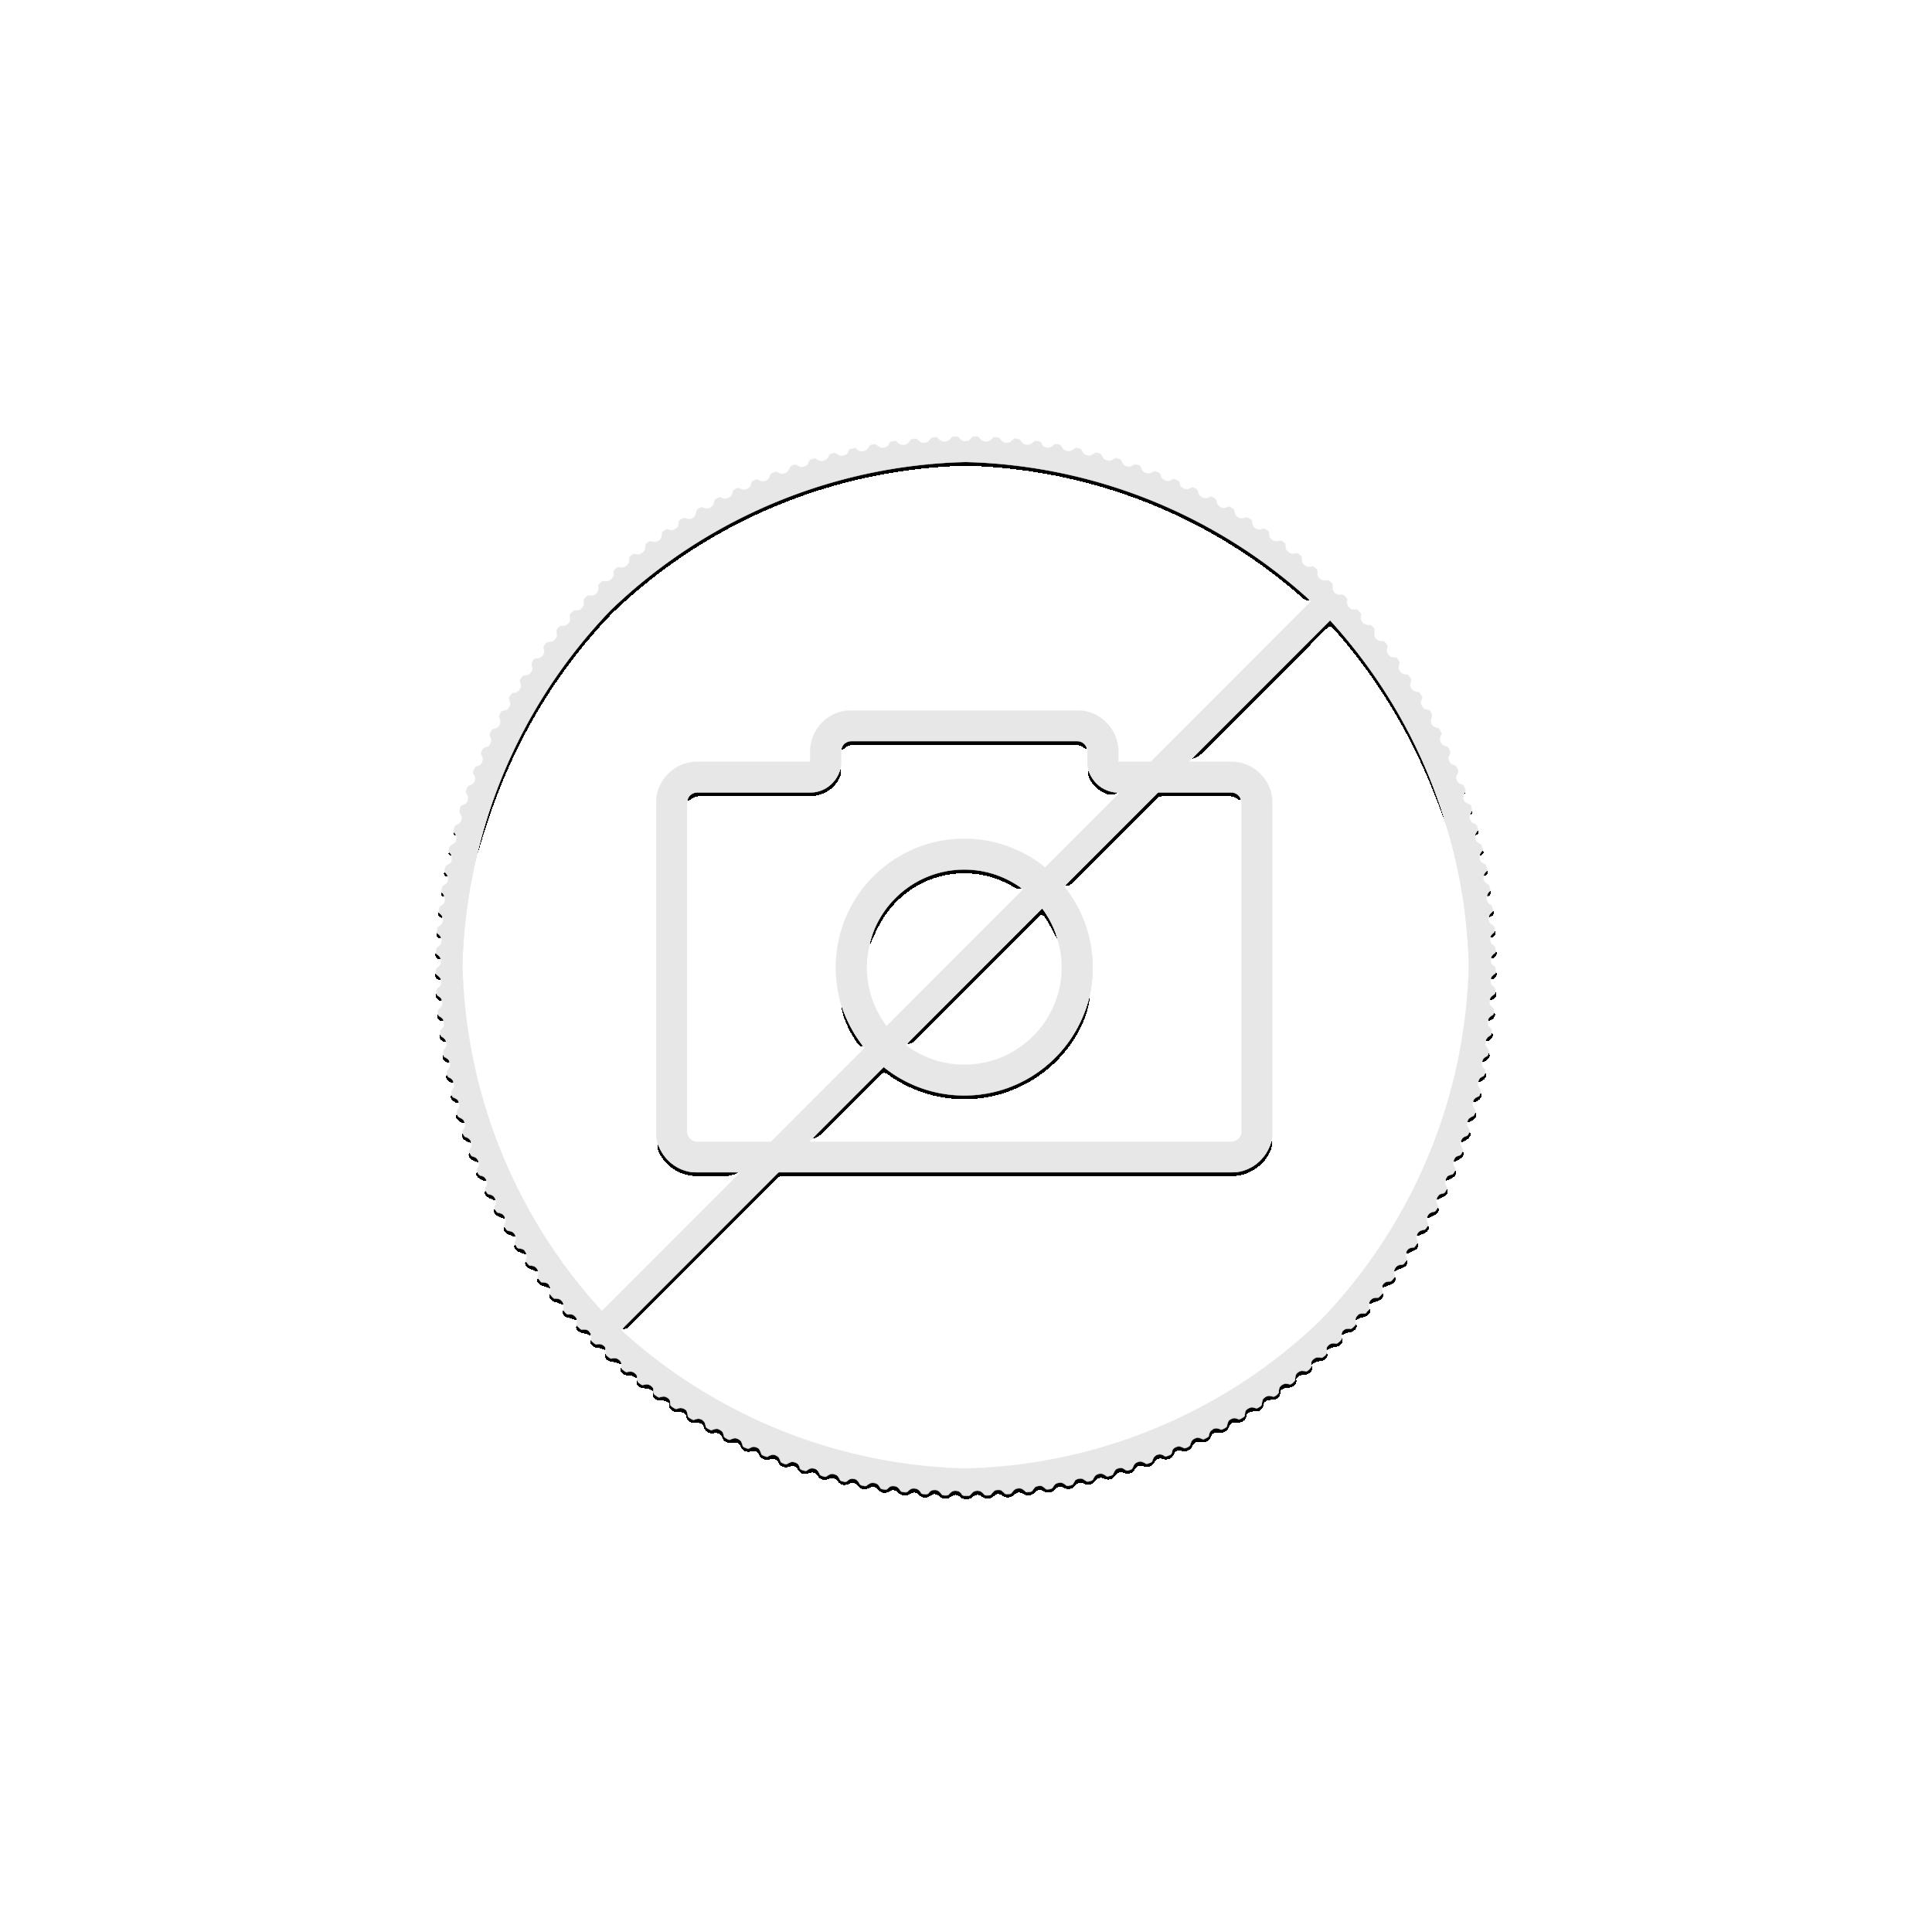 1 troy ounce silver coin Kong 2021